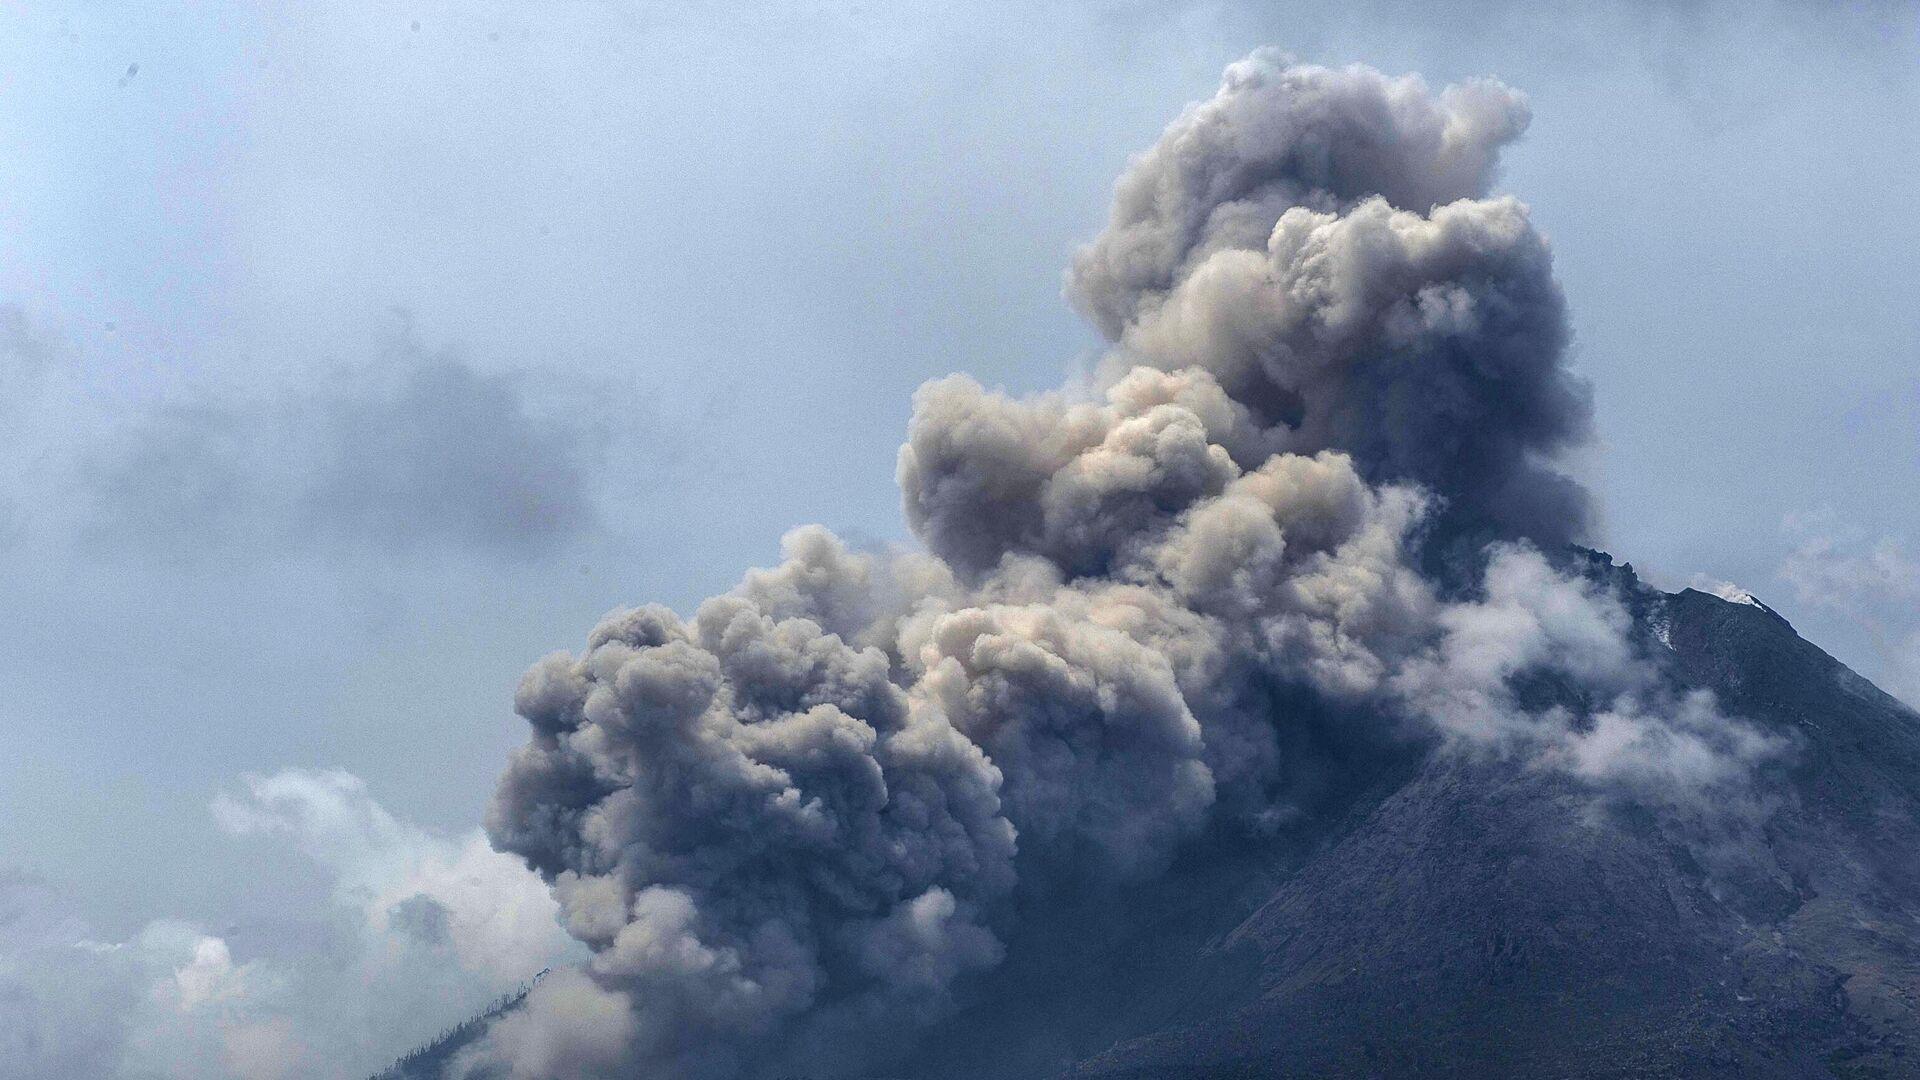 Извержение вулкана Синабунг в провинции Северная Суматра в Индонезии - РИА Новости, 1920, 20.03.2021